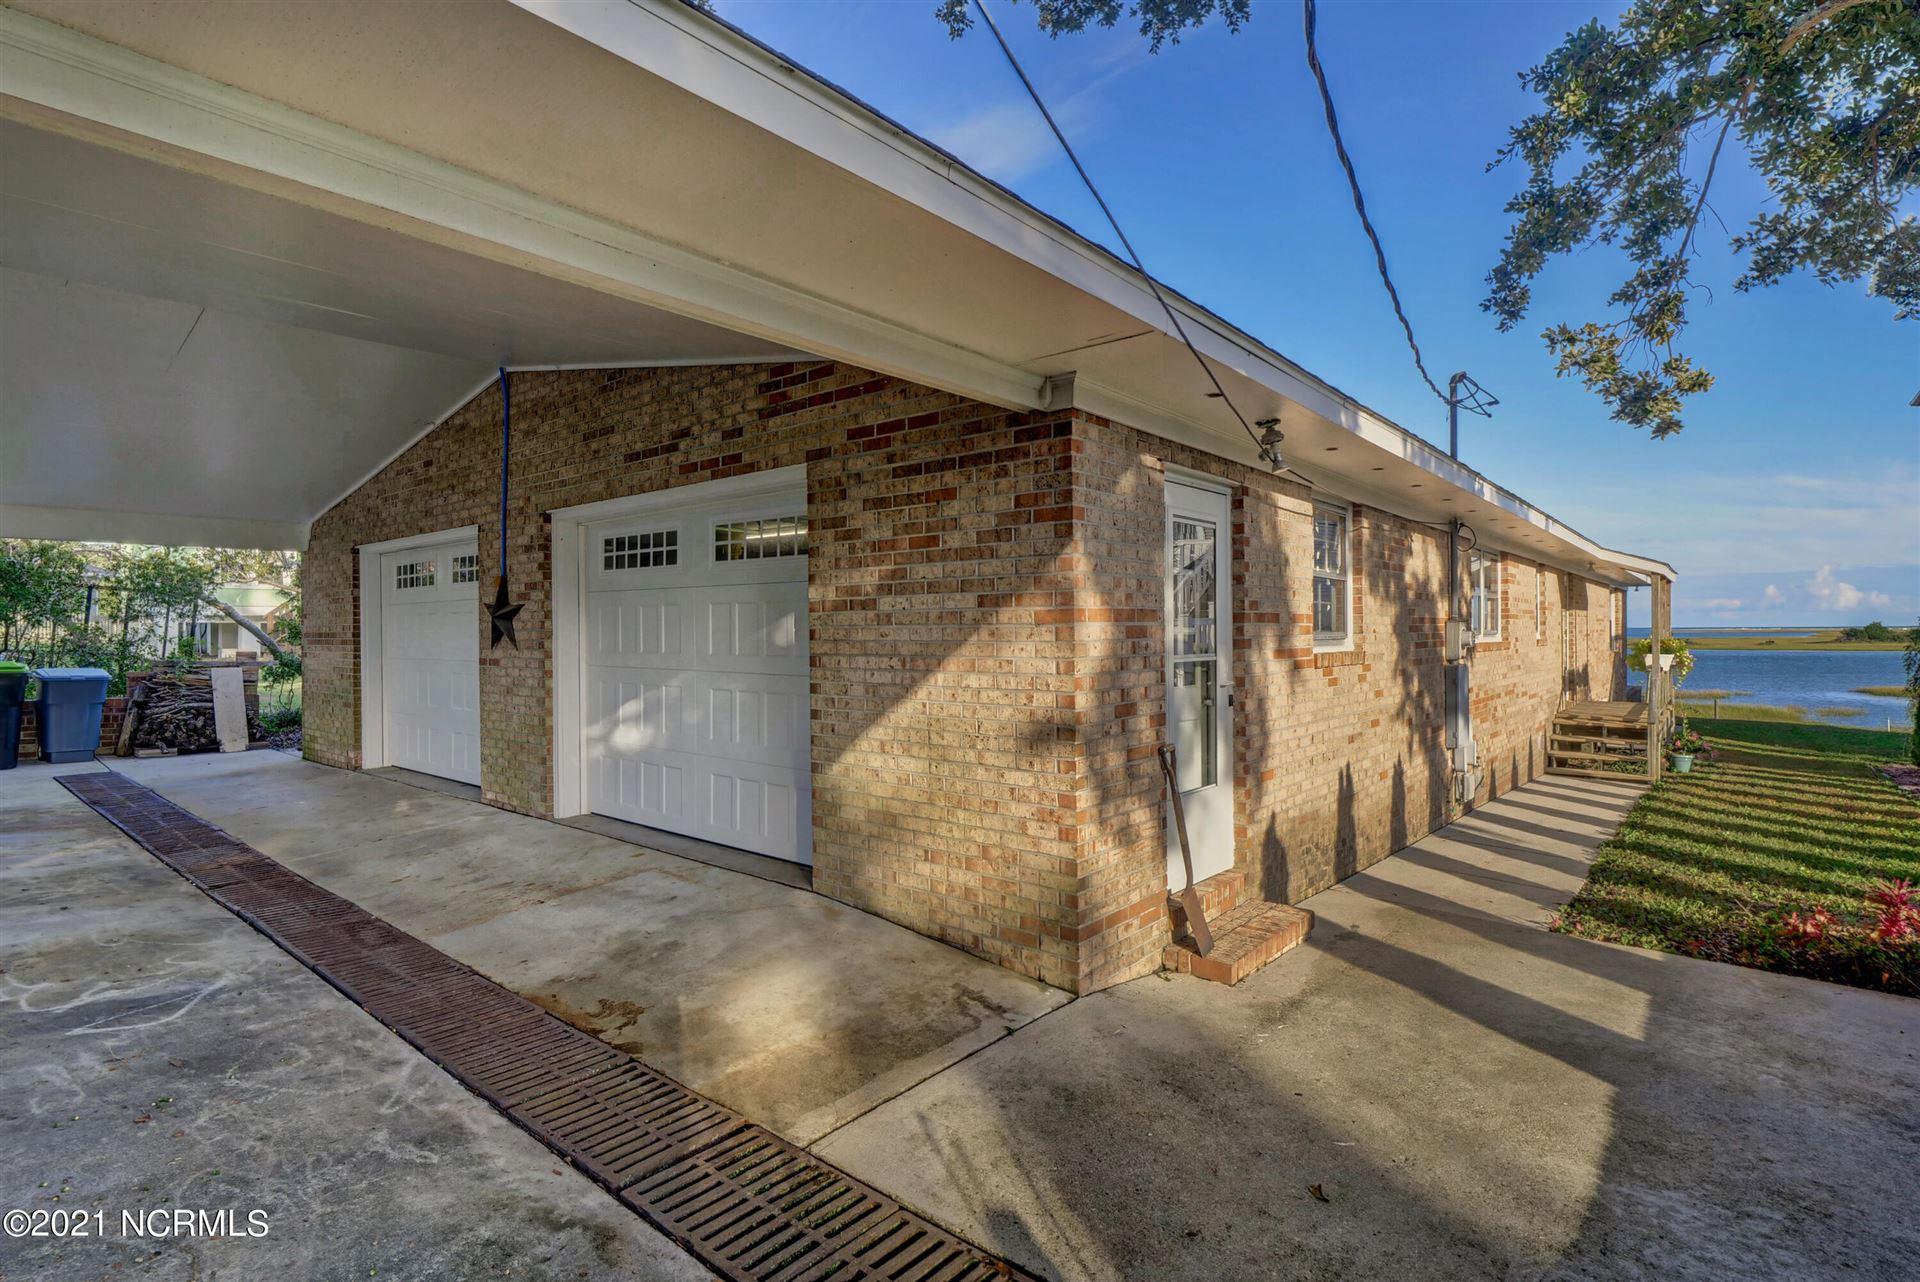 Photo of 114 Broadview Lane, Hampstead, NC 28443 (MLS # 100293192)